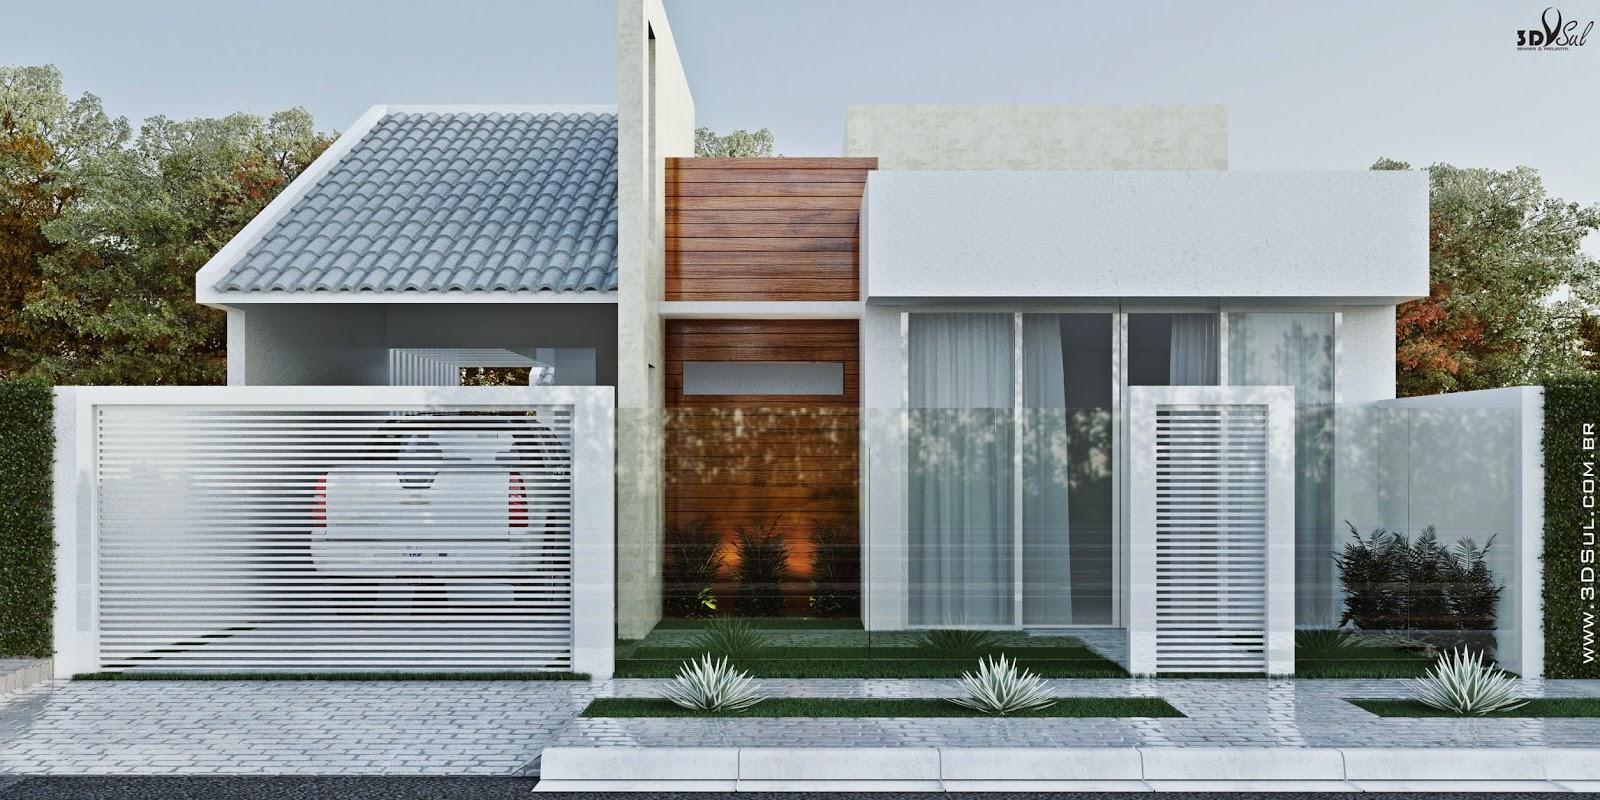 3dsul Maquete Eletr Nica 3d Fachada 3d De Casa